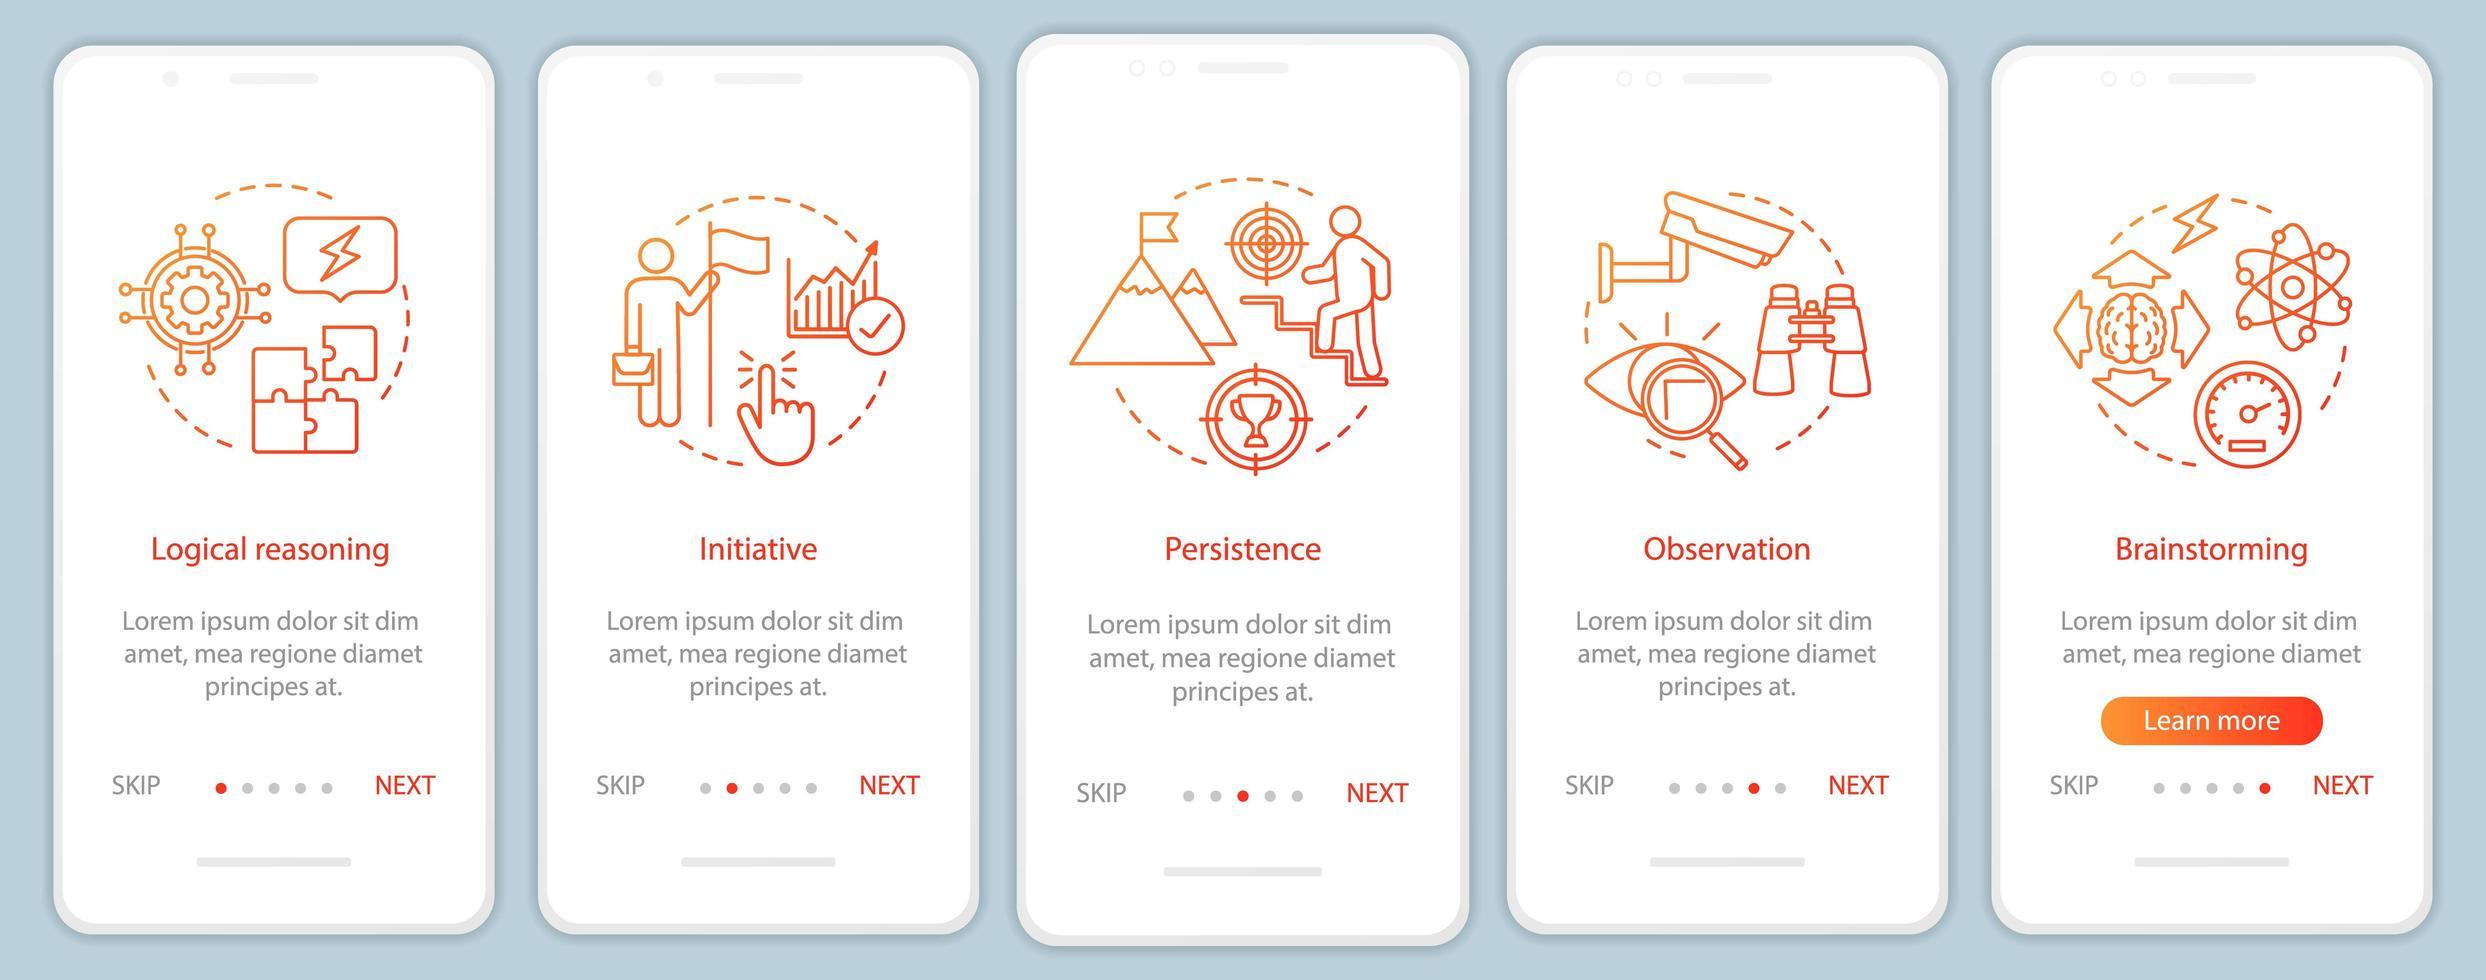 professionele kwaliteiten onboarding mobiele app-pagina vector